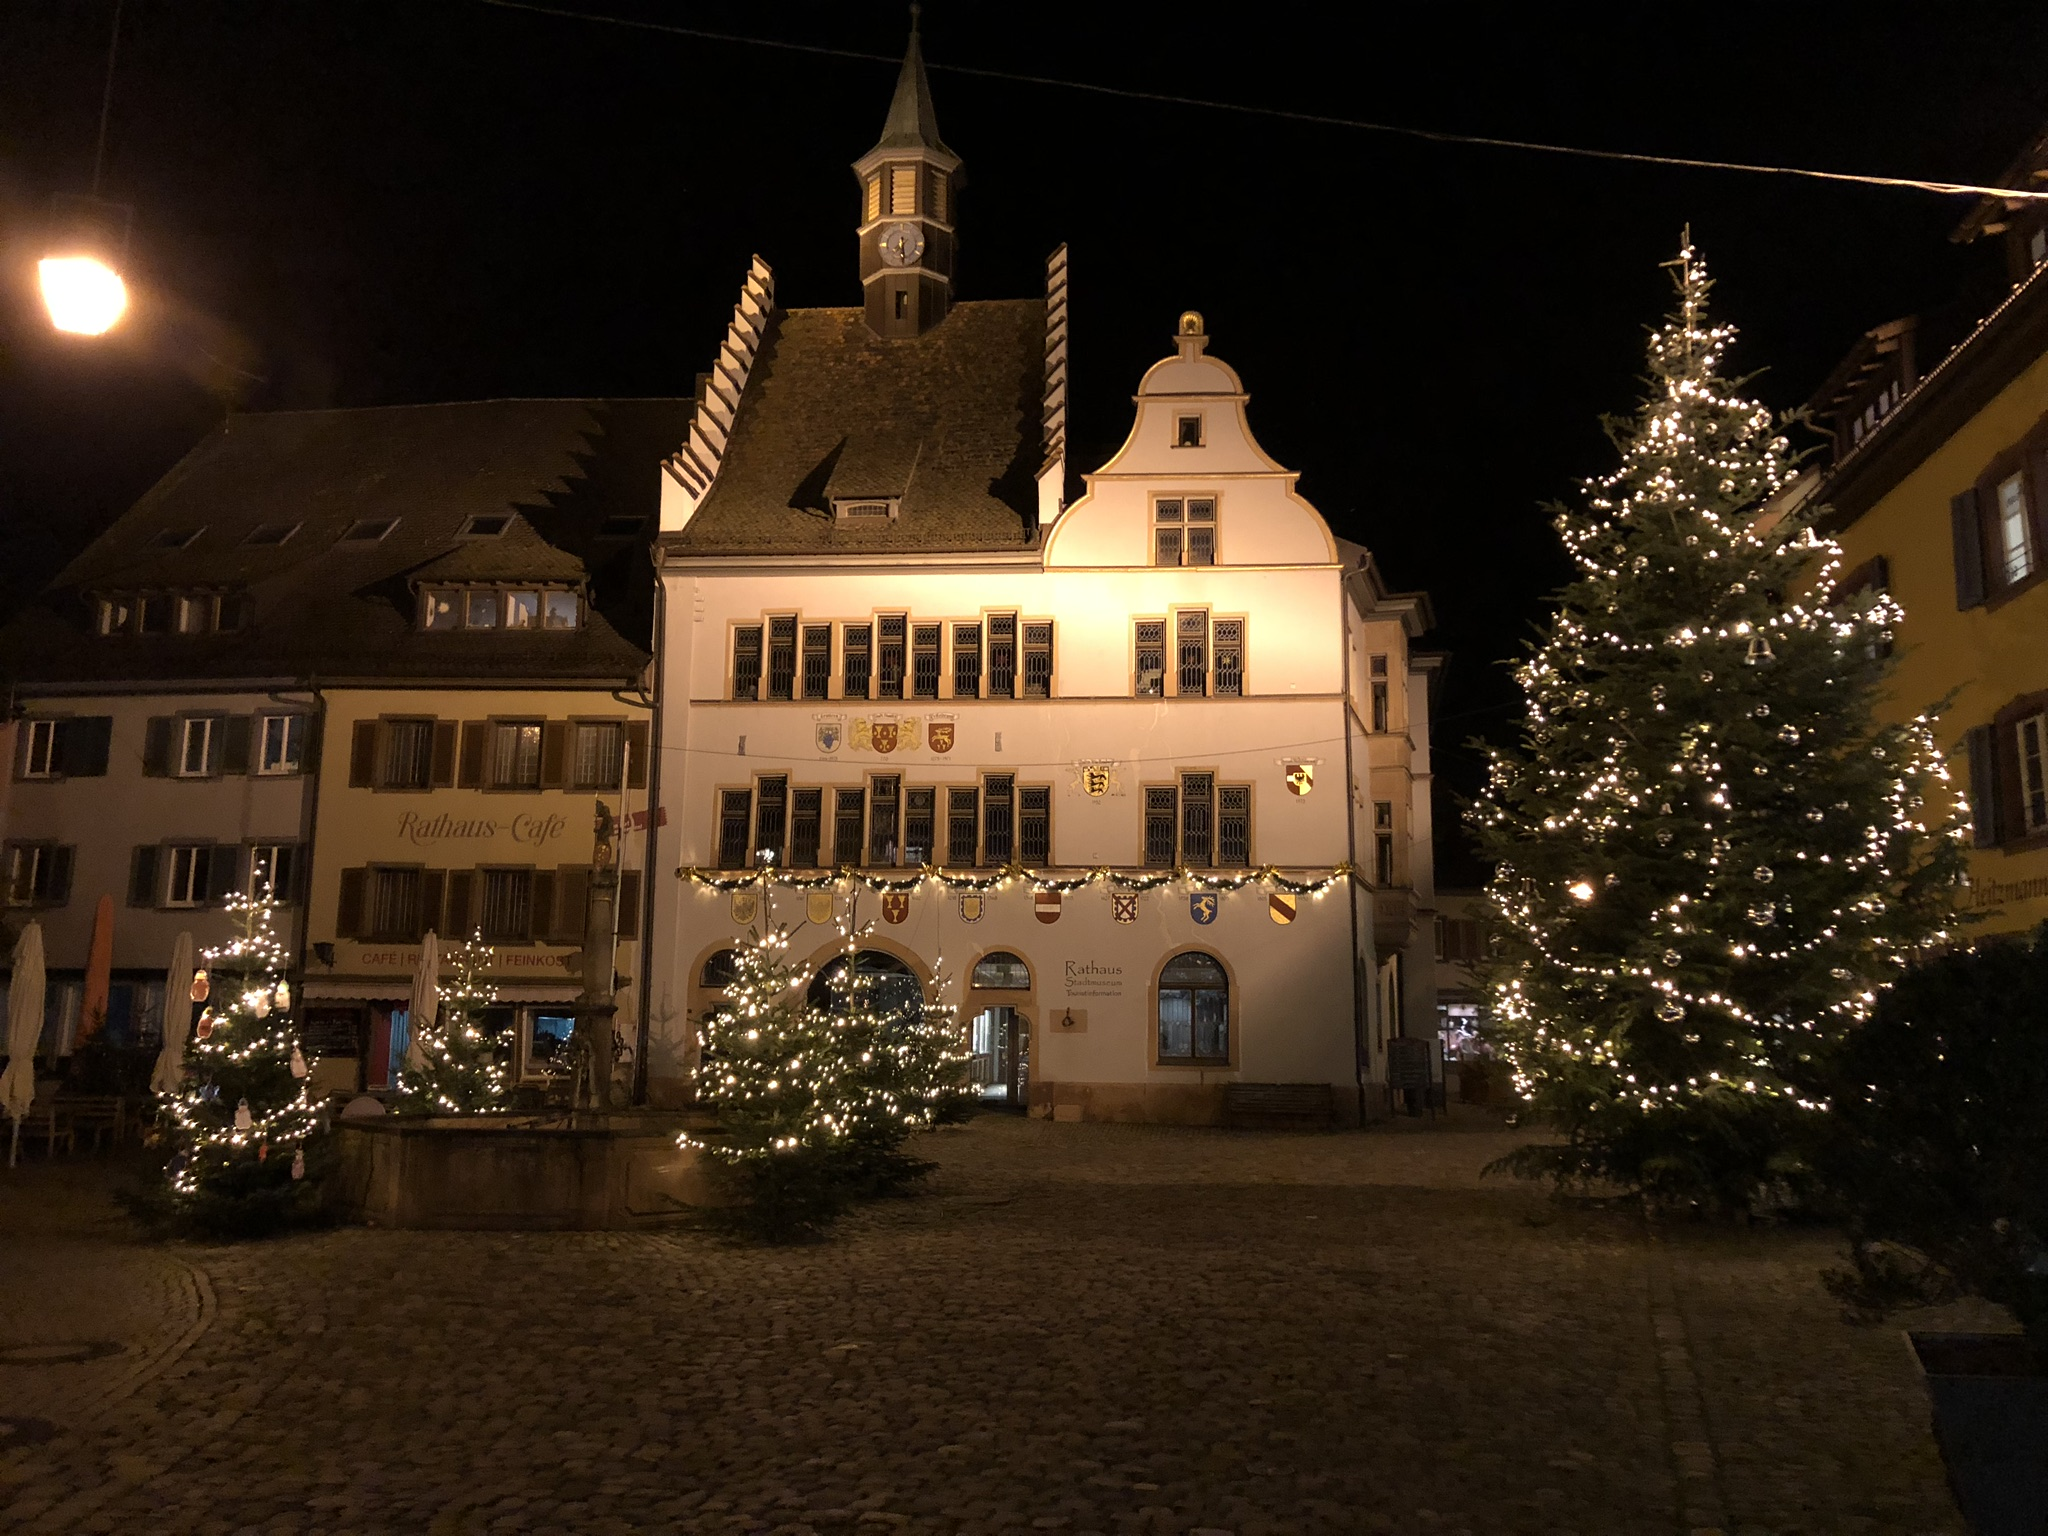 Altstaufener Weihnachtsmarkt